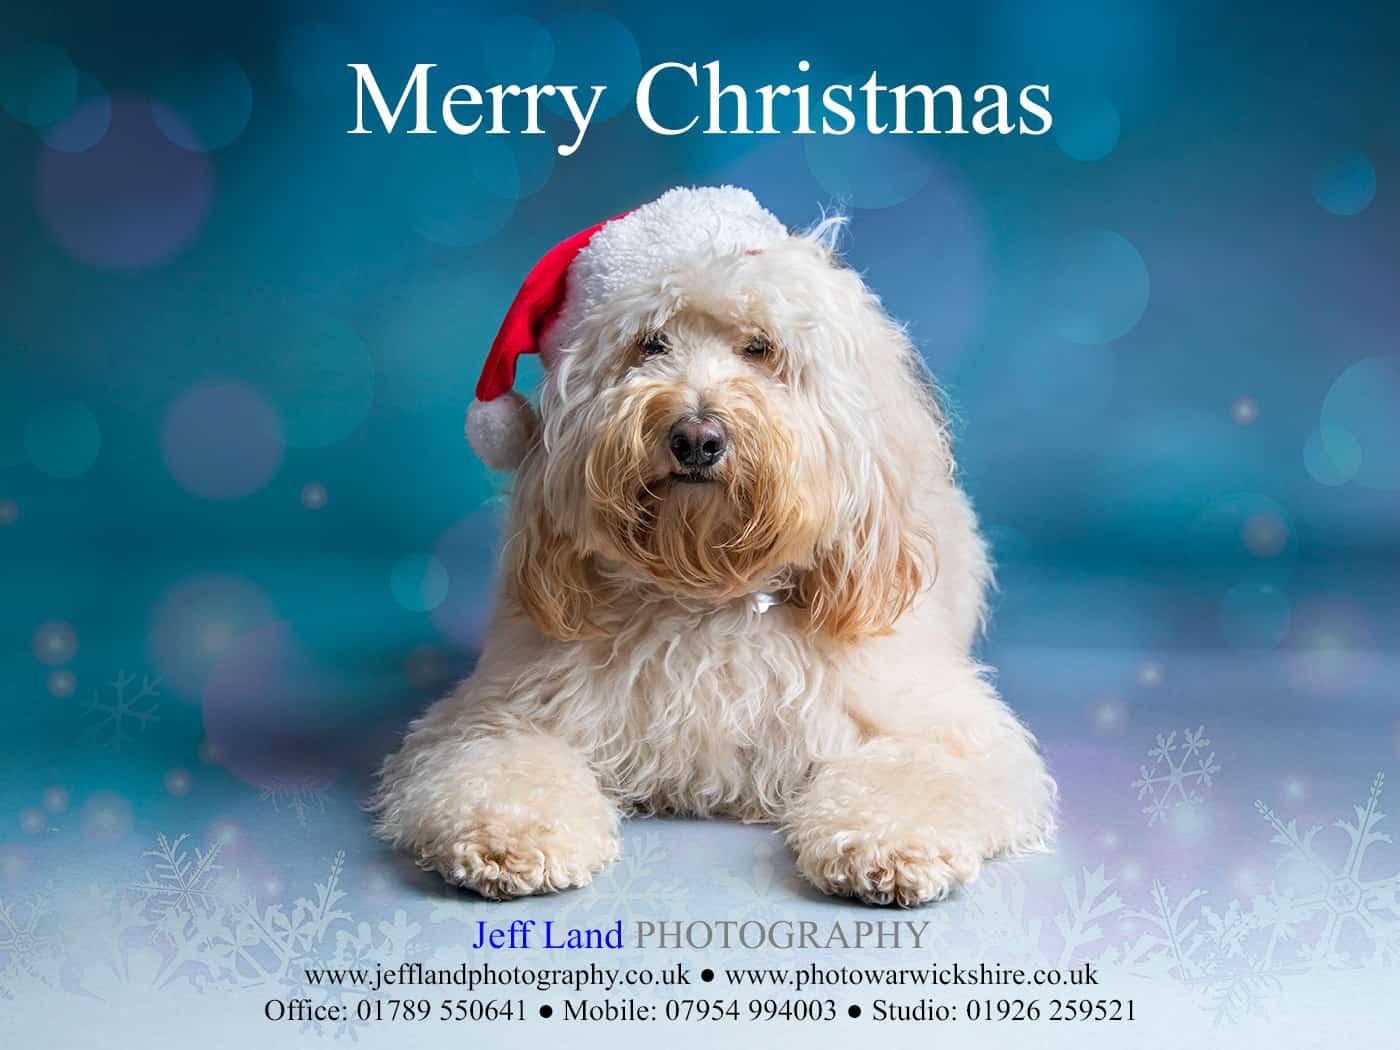 Christmas Card, Cockapoo, Jeff Land Photography, Studio Photography, Stratford-upon-Avon